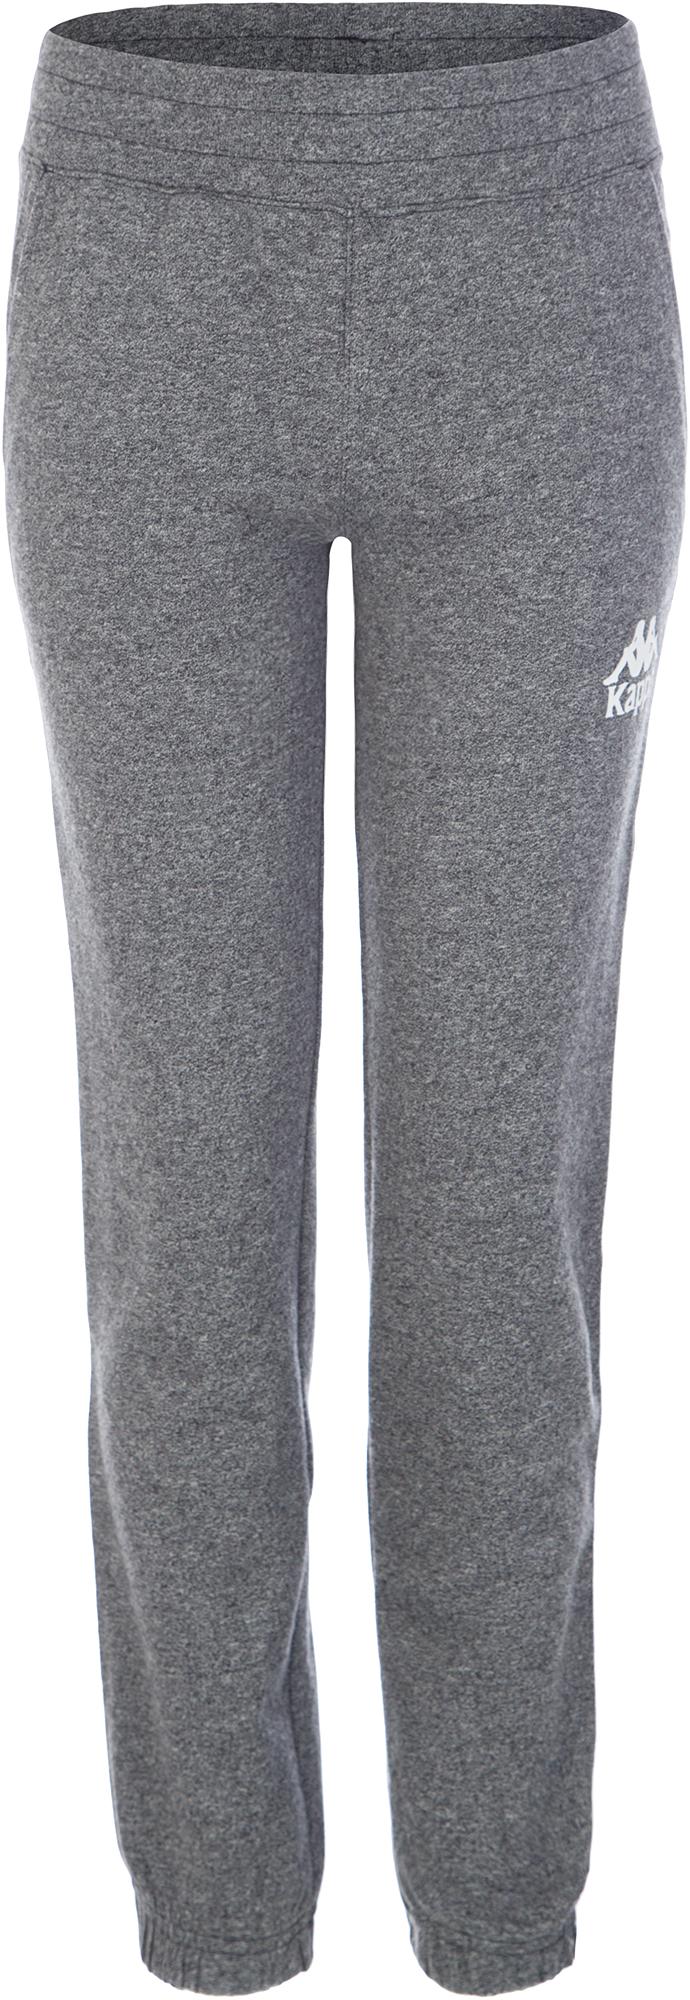 Kappa Брюки для девочек Kappa, размер 134 kappa брюки для девочек kappa размер 134